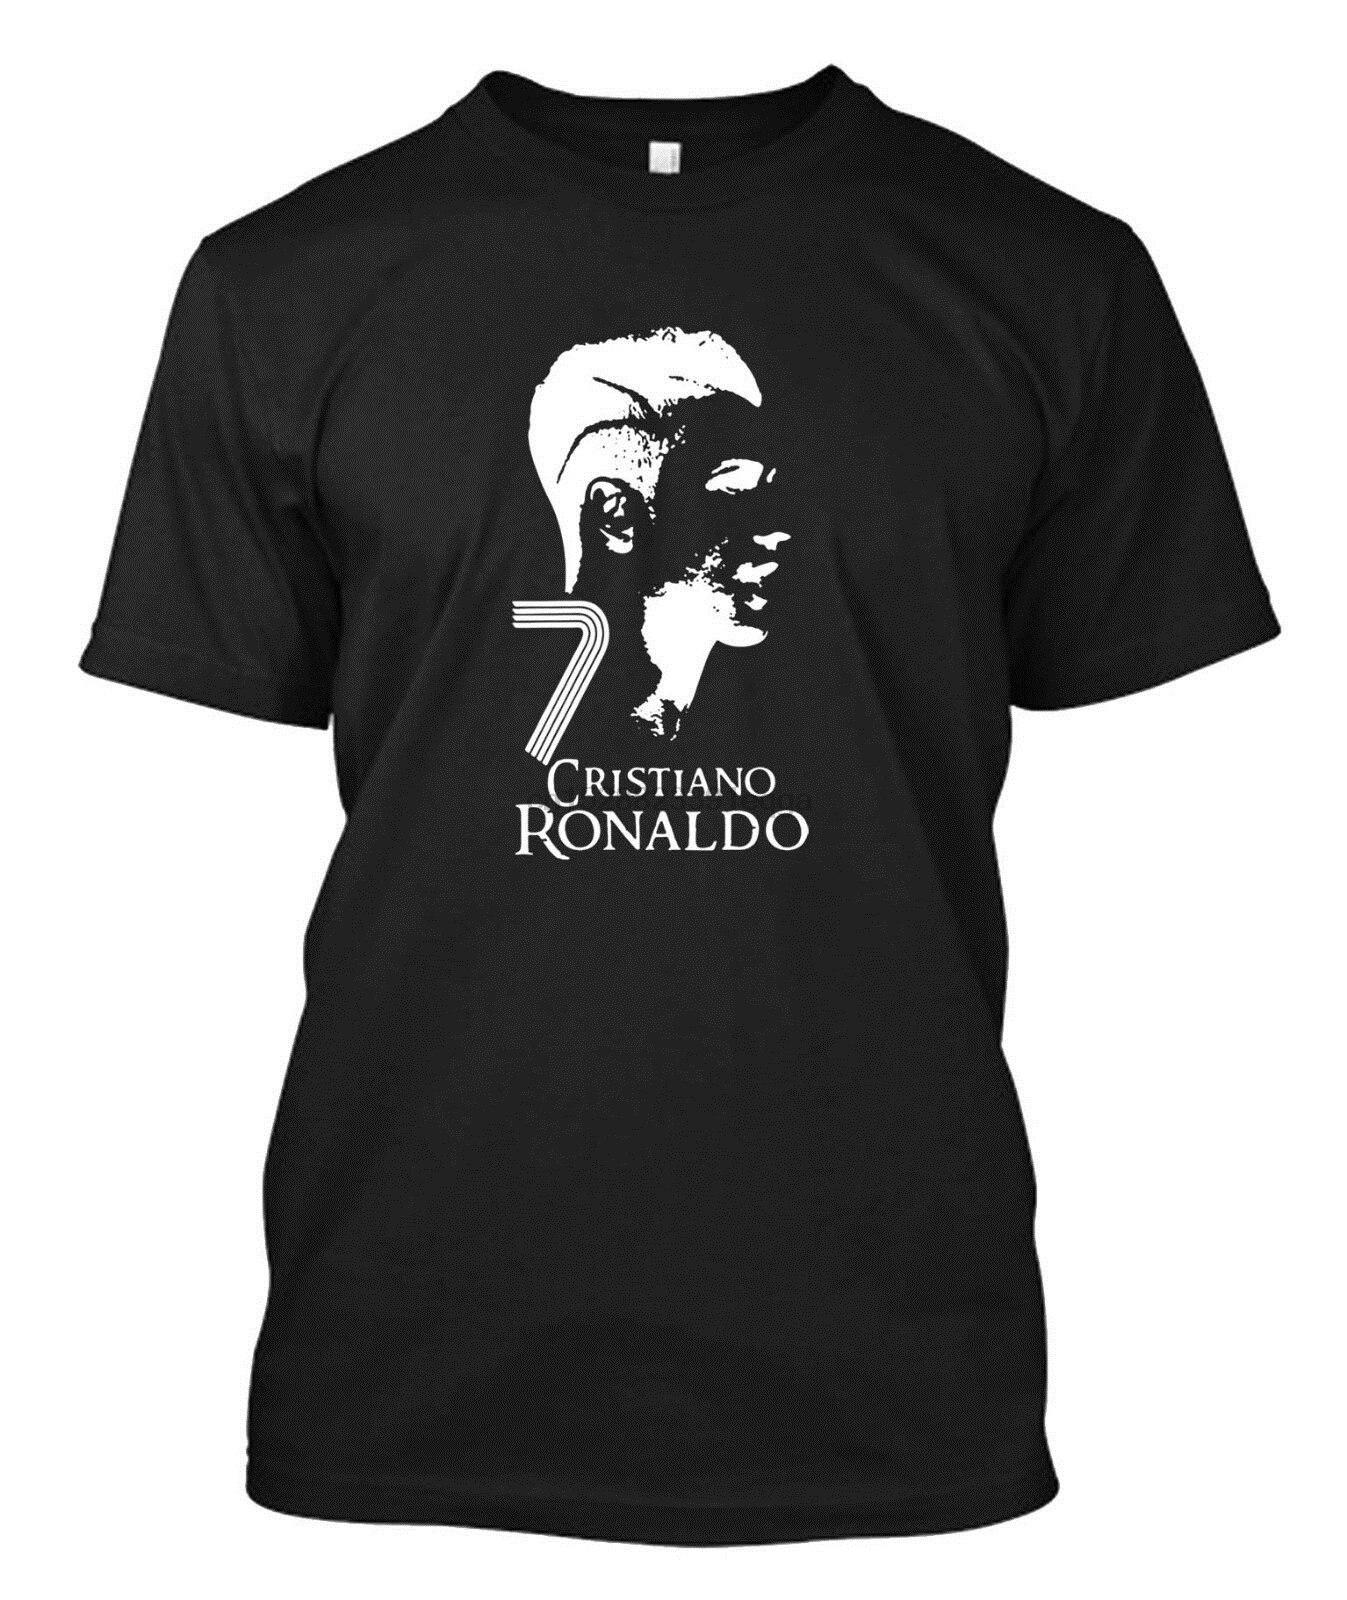 Cristiano Ronaldo CR7-camiseta negra personalizada para hombres camiseta Cool Casual pride camiseta hombres Unisex camiseta de moda envío gratis divertido